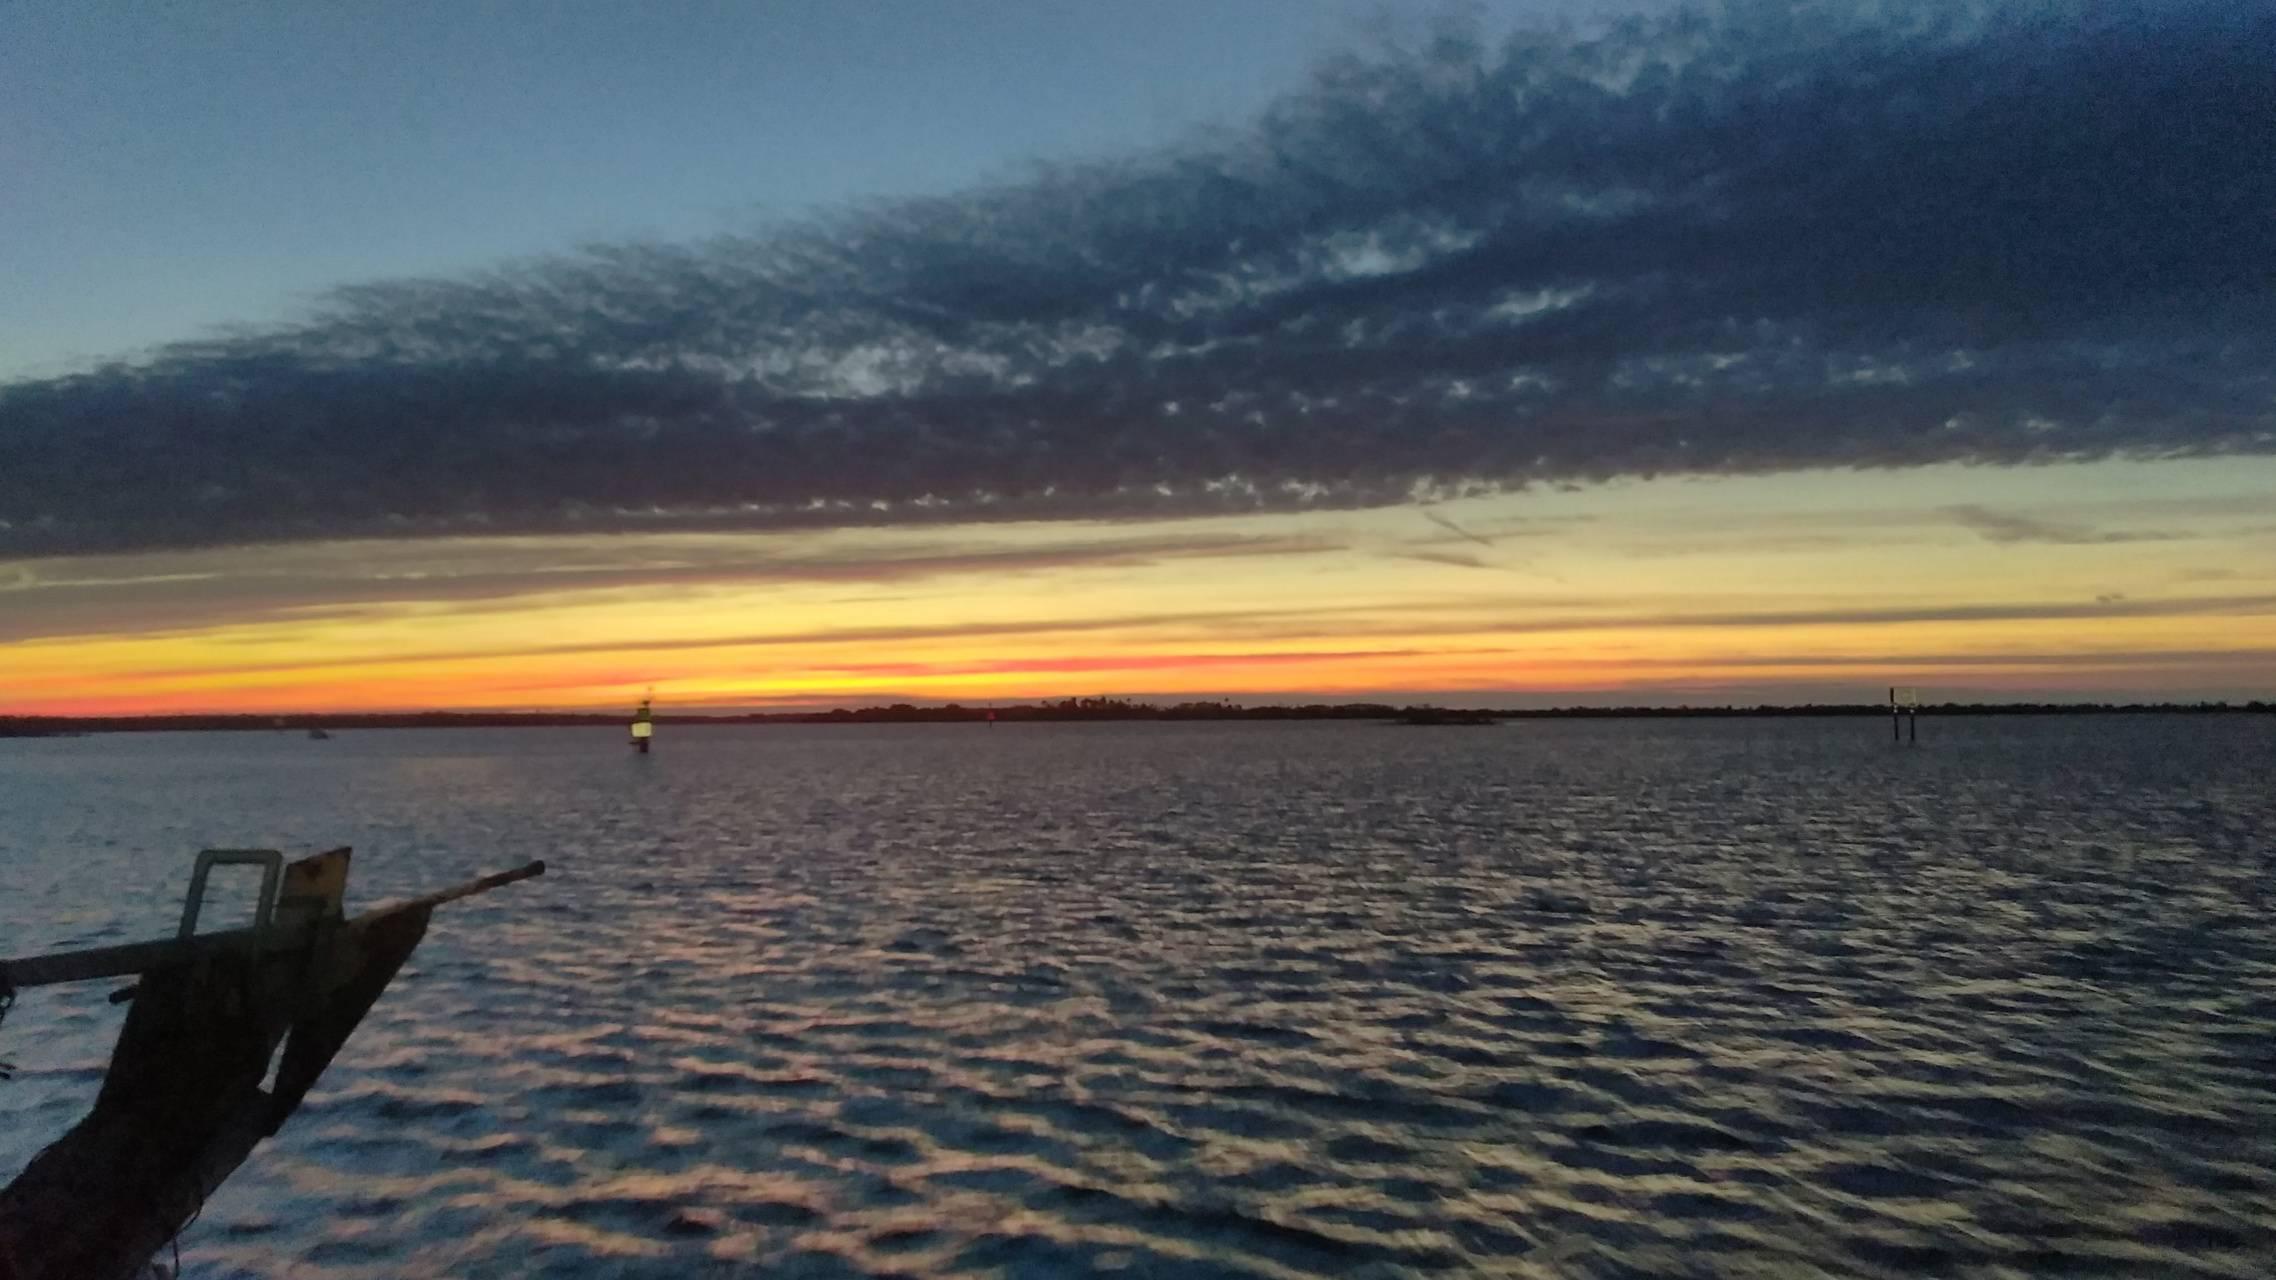 Sun set in the Gulf